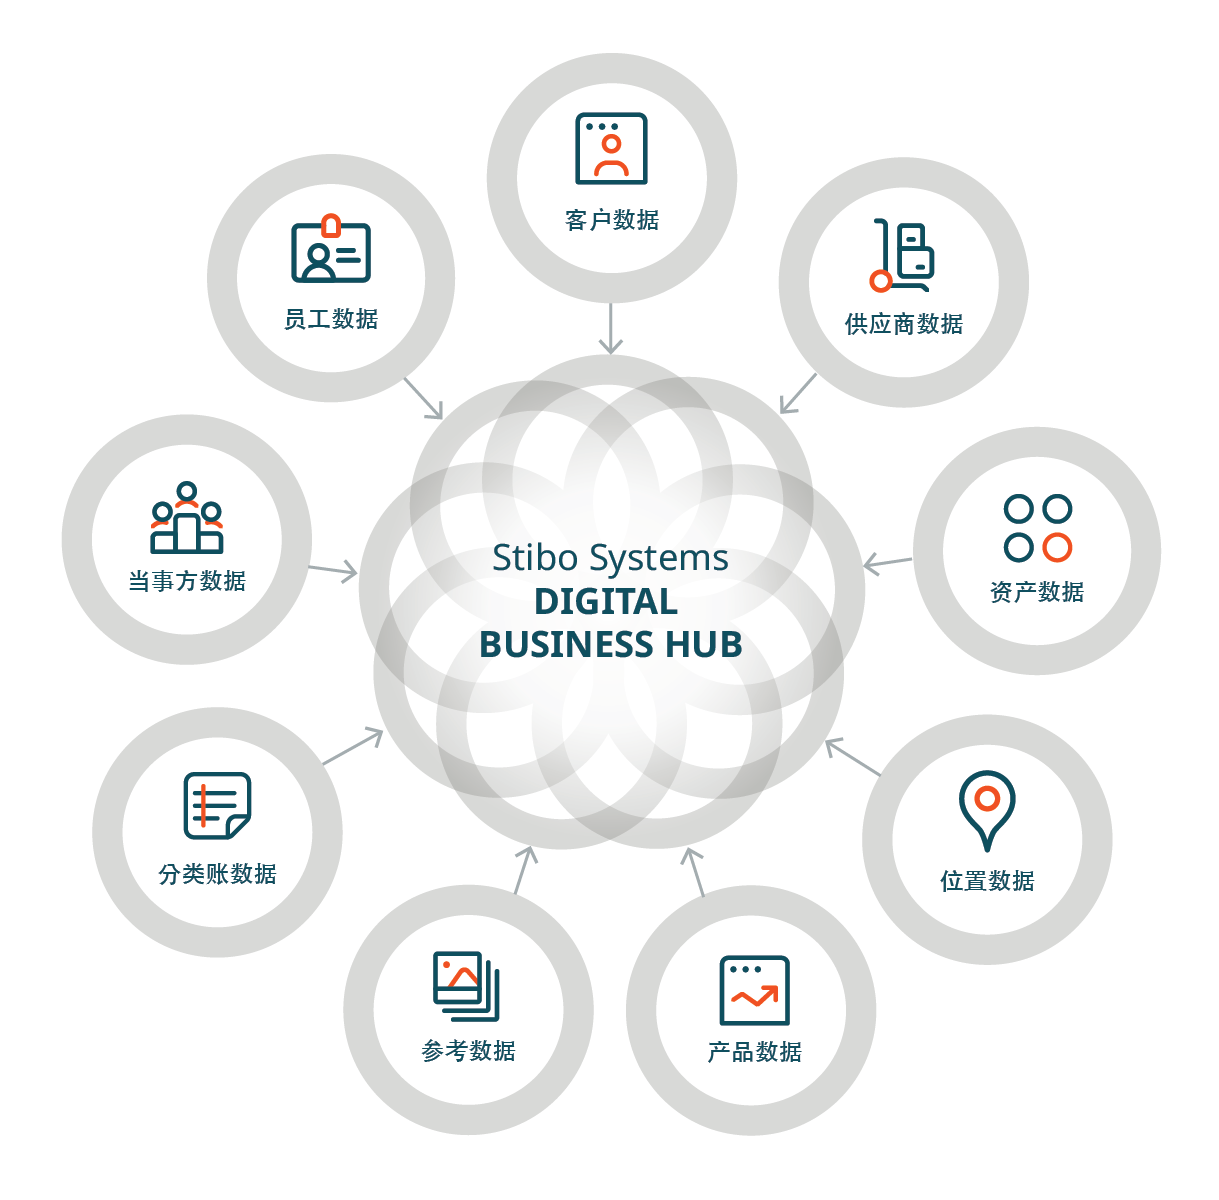 web_digital business hub domains_translations-CN